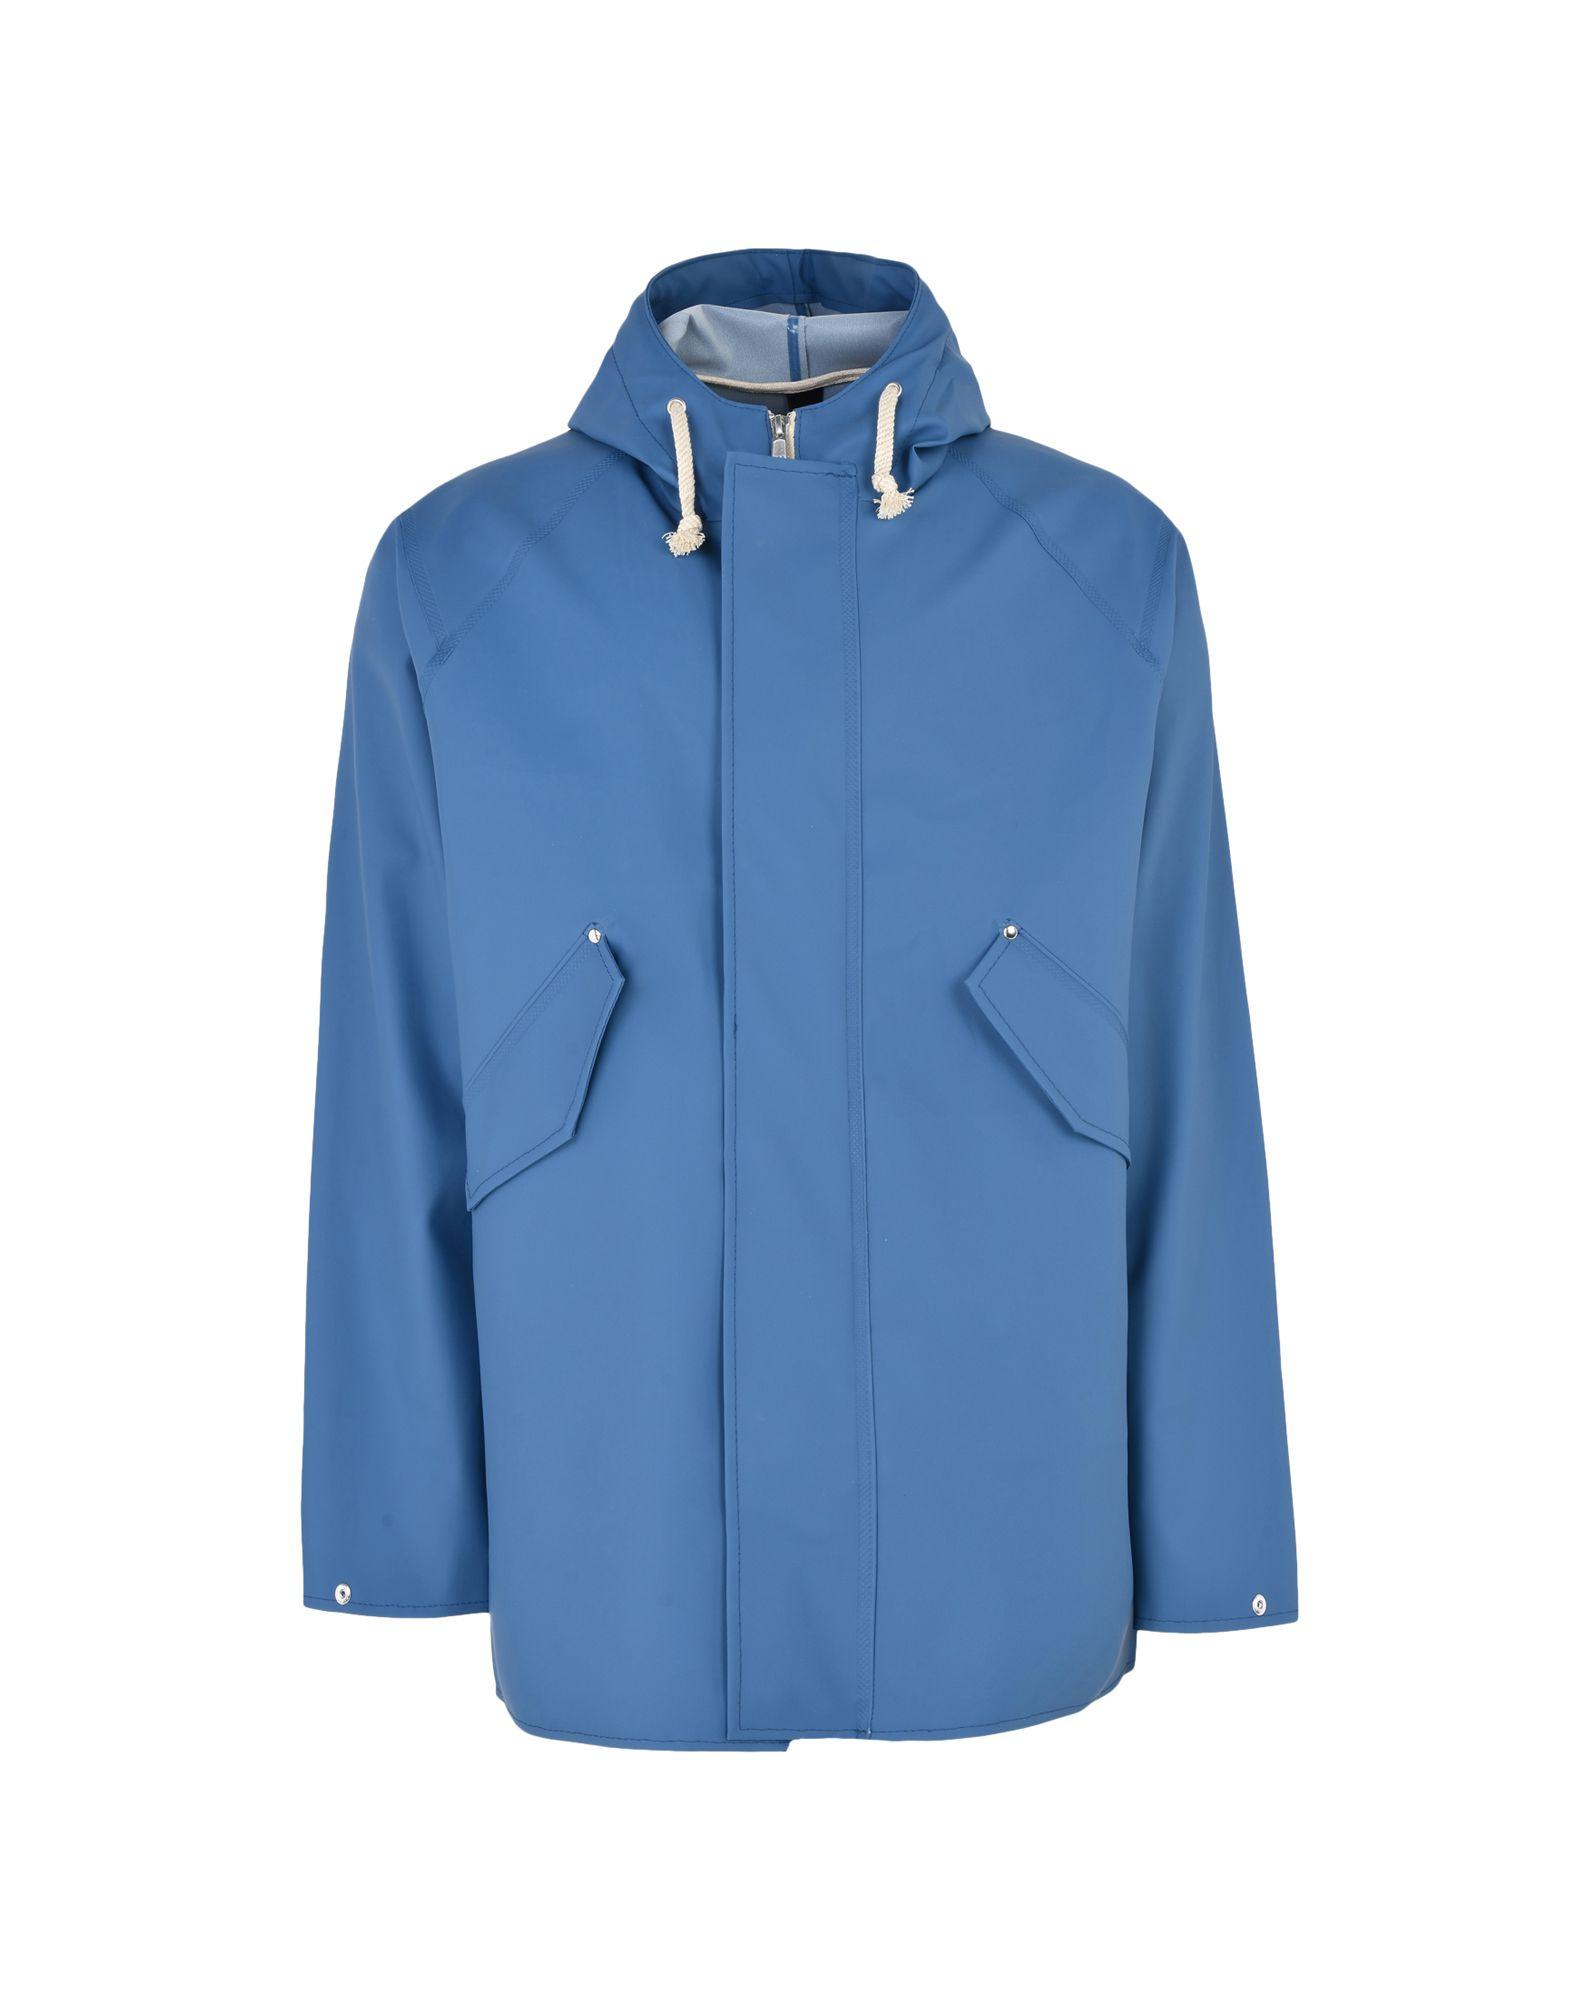 ELKA Full-Length Jacket in Slate Blue